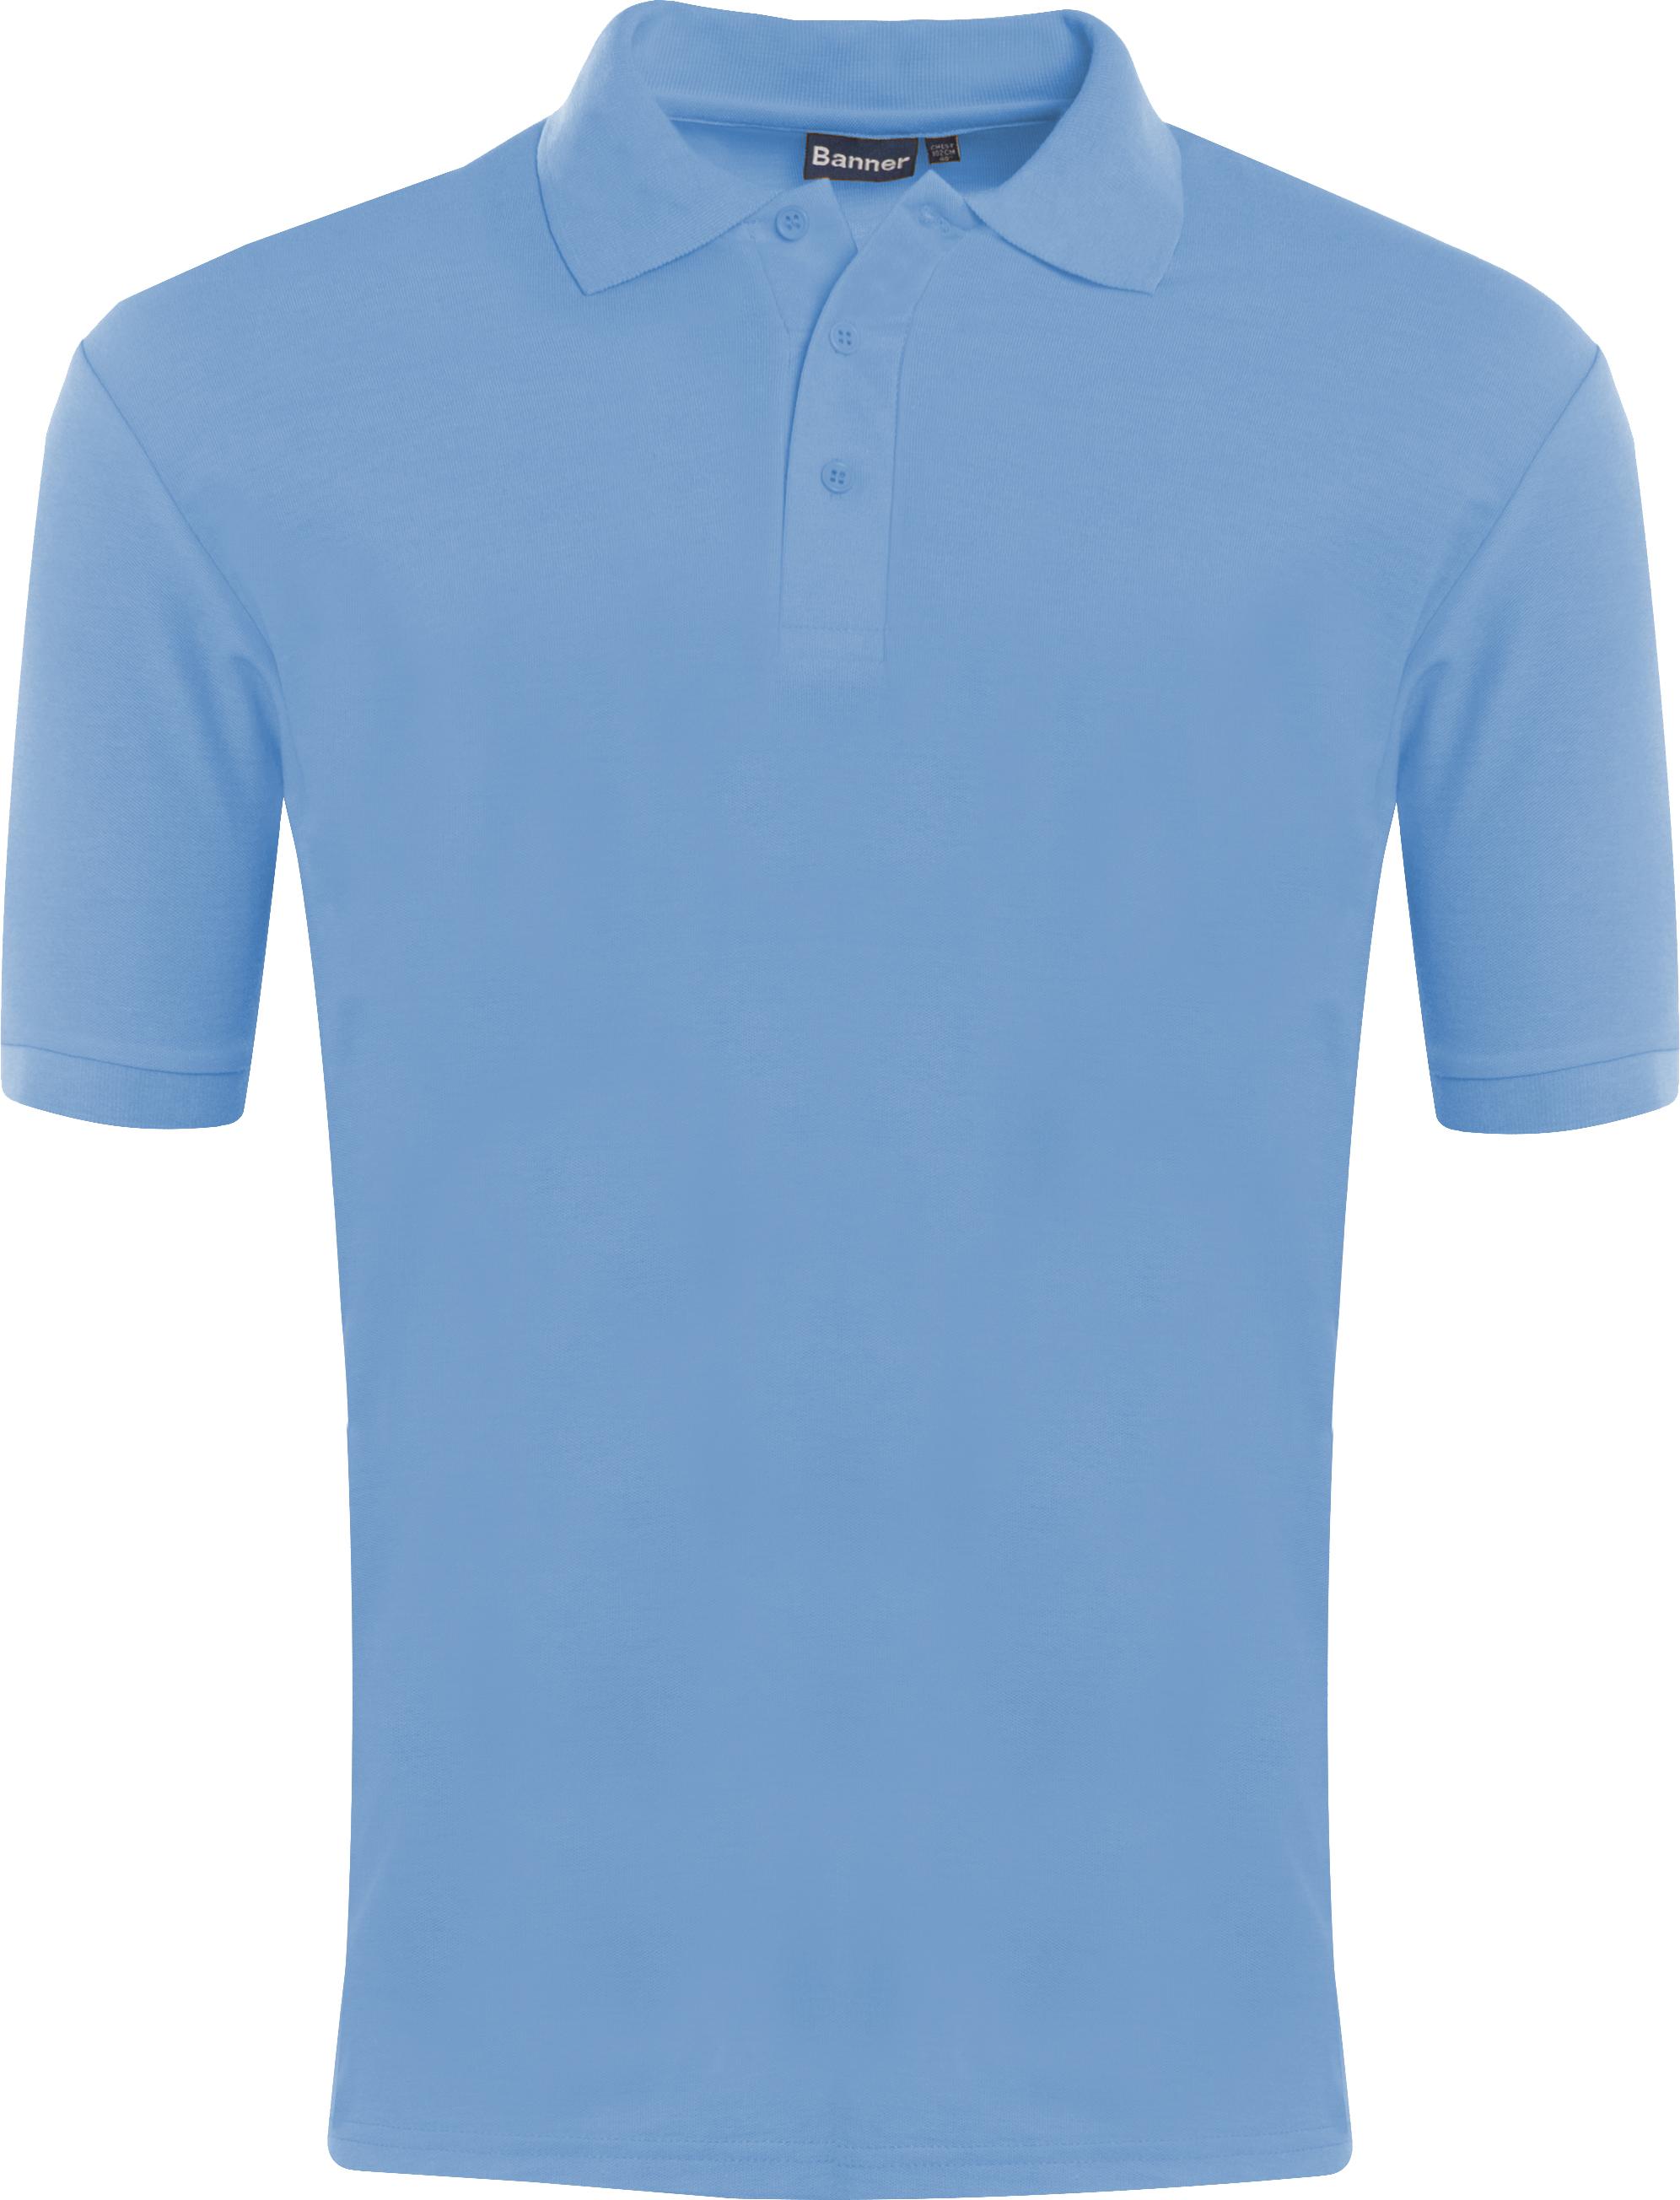 Braidbar Nursery Poloshirt (Sky Blue or White)